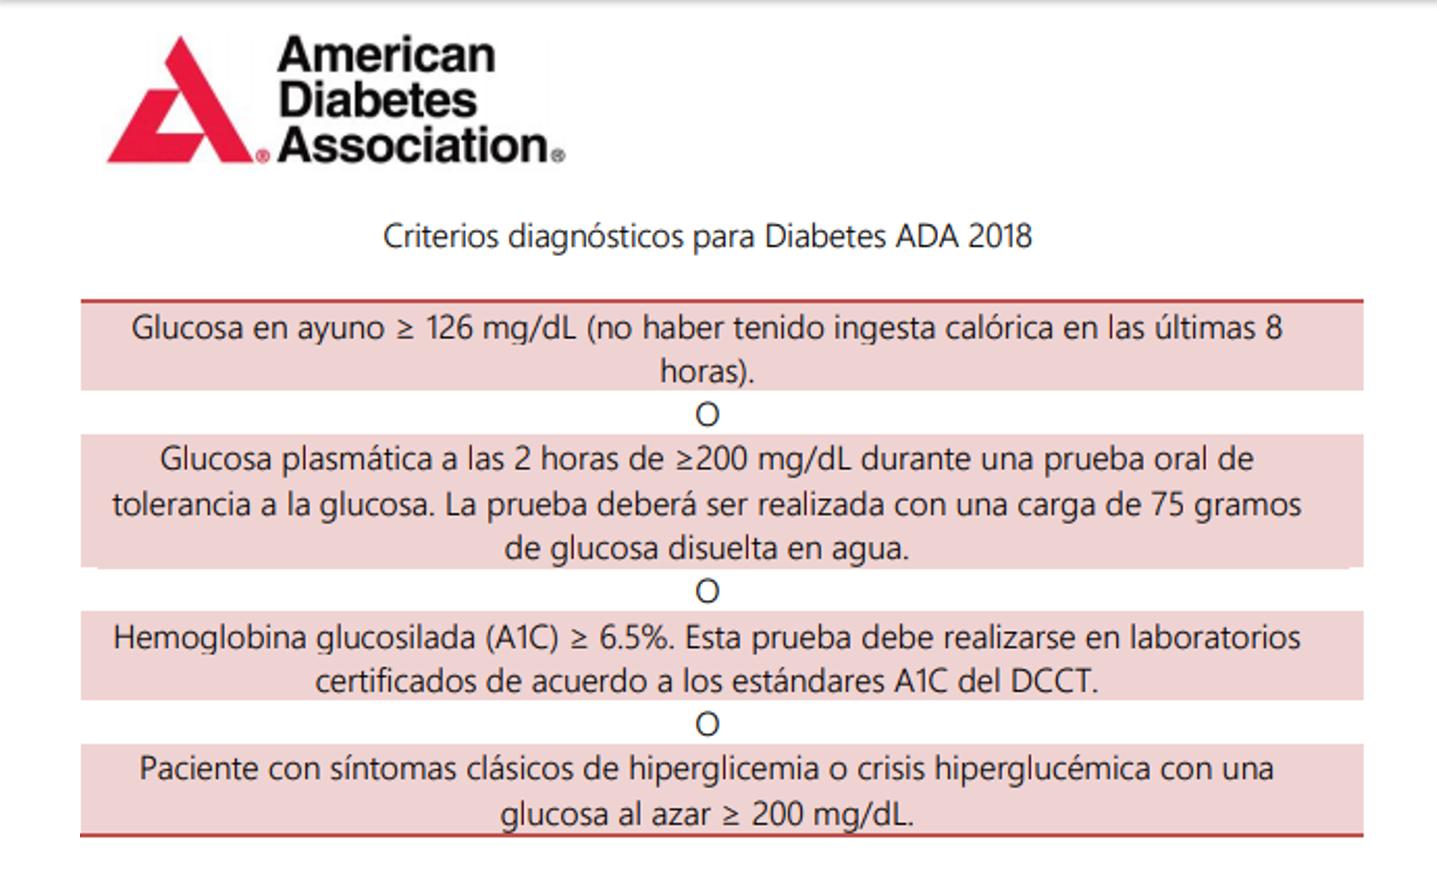 diabetes de desmielinización segmentaria